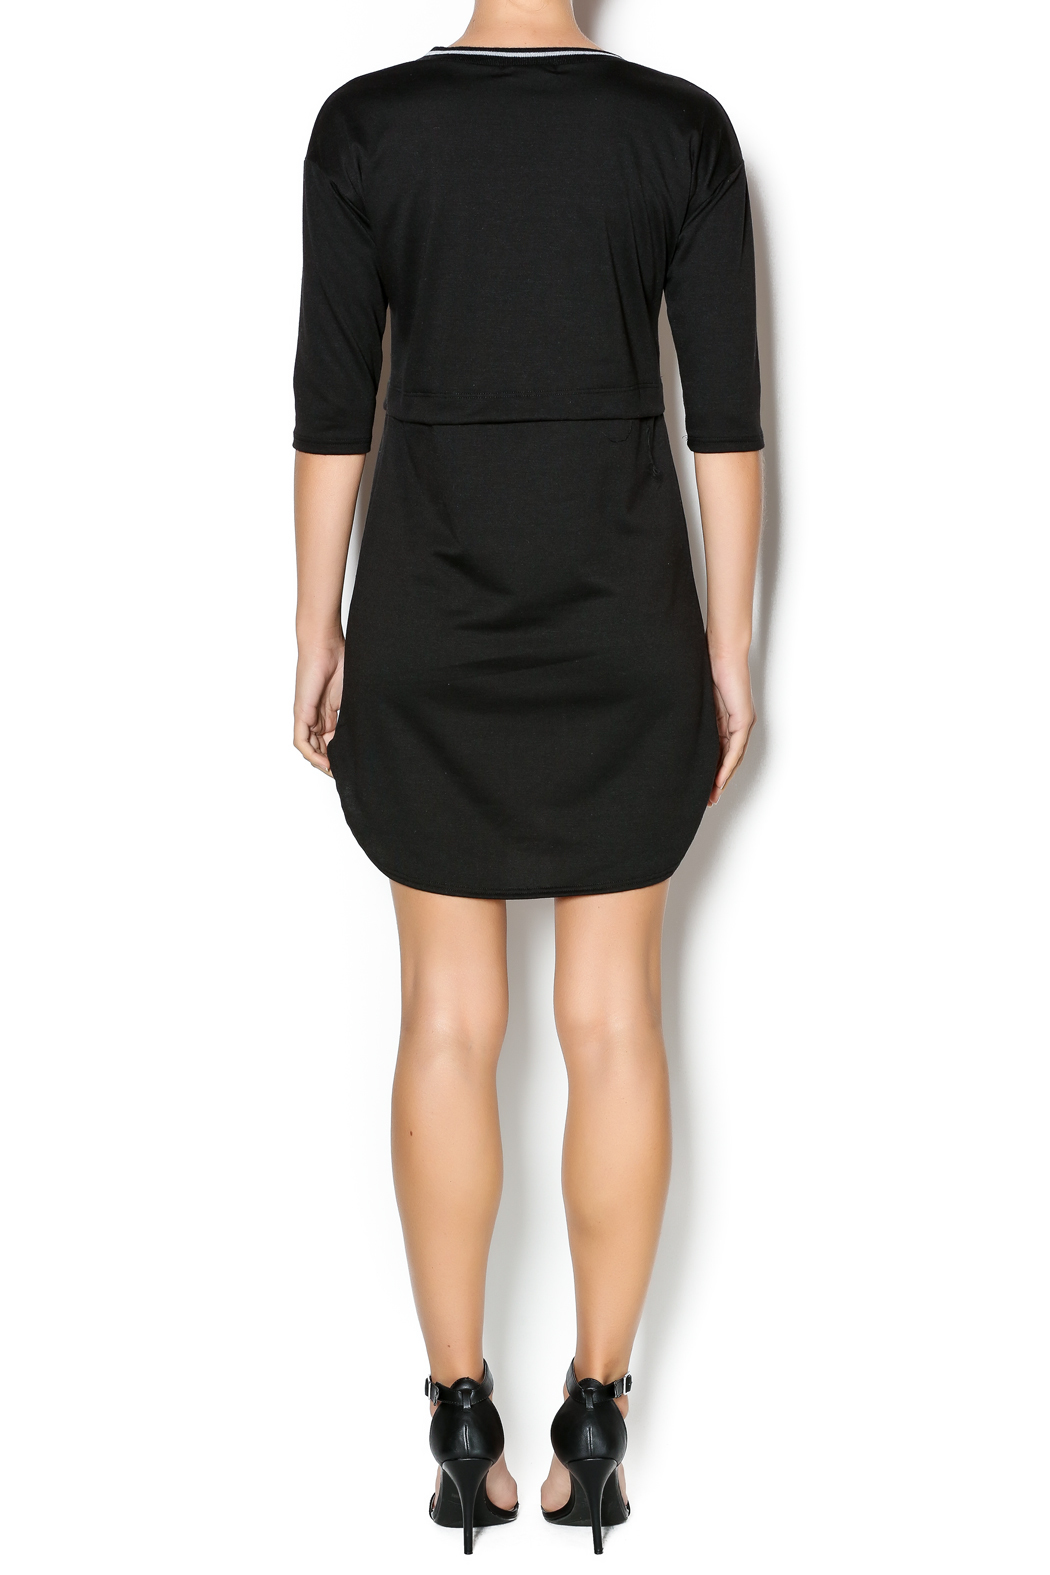 black casual dress photo - 1